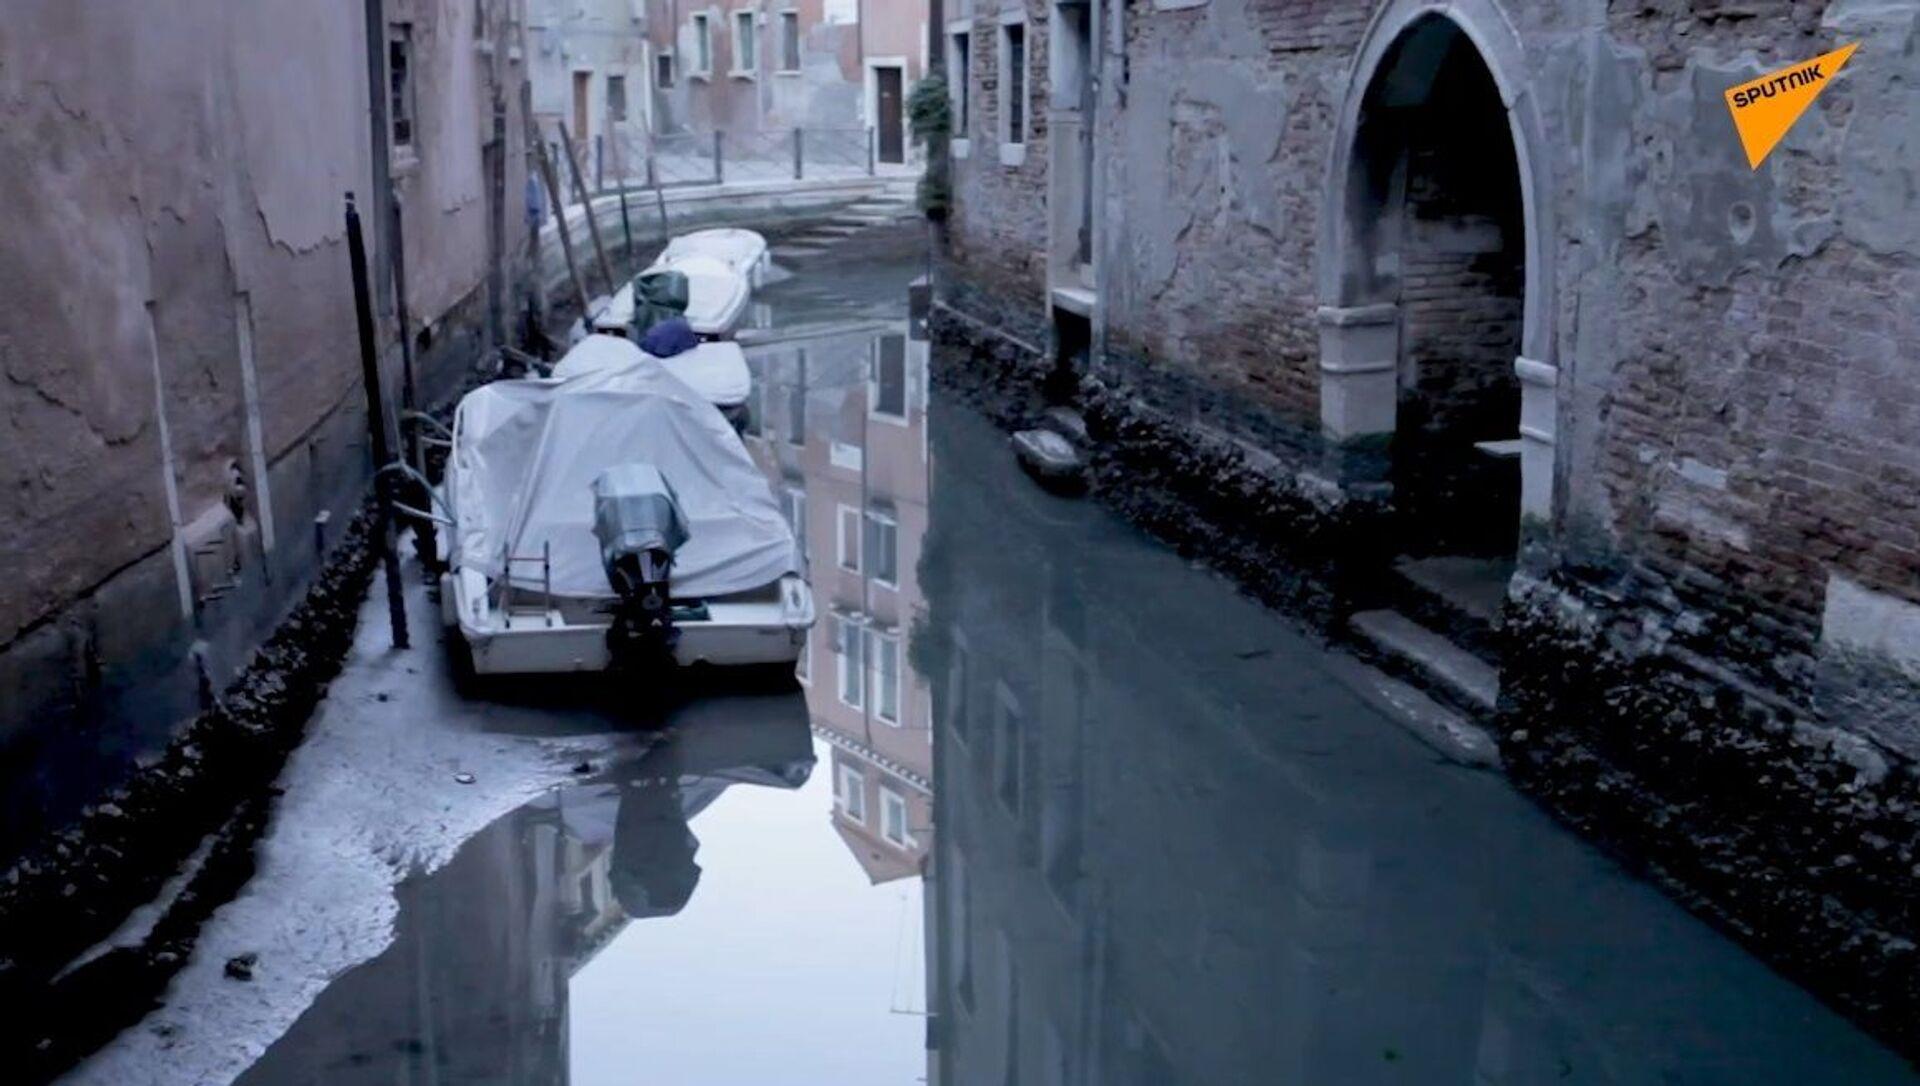 Venezia: l'acqua bassa e canali a secco - Sputnik Italia, 1920, 03.03.2021